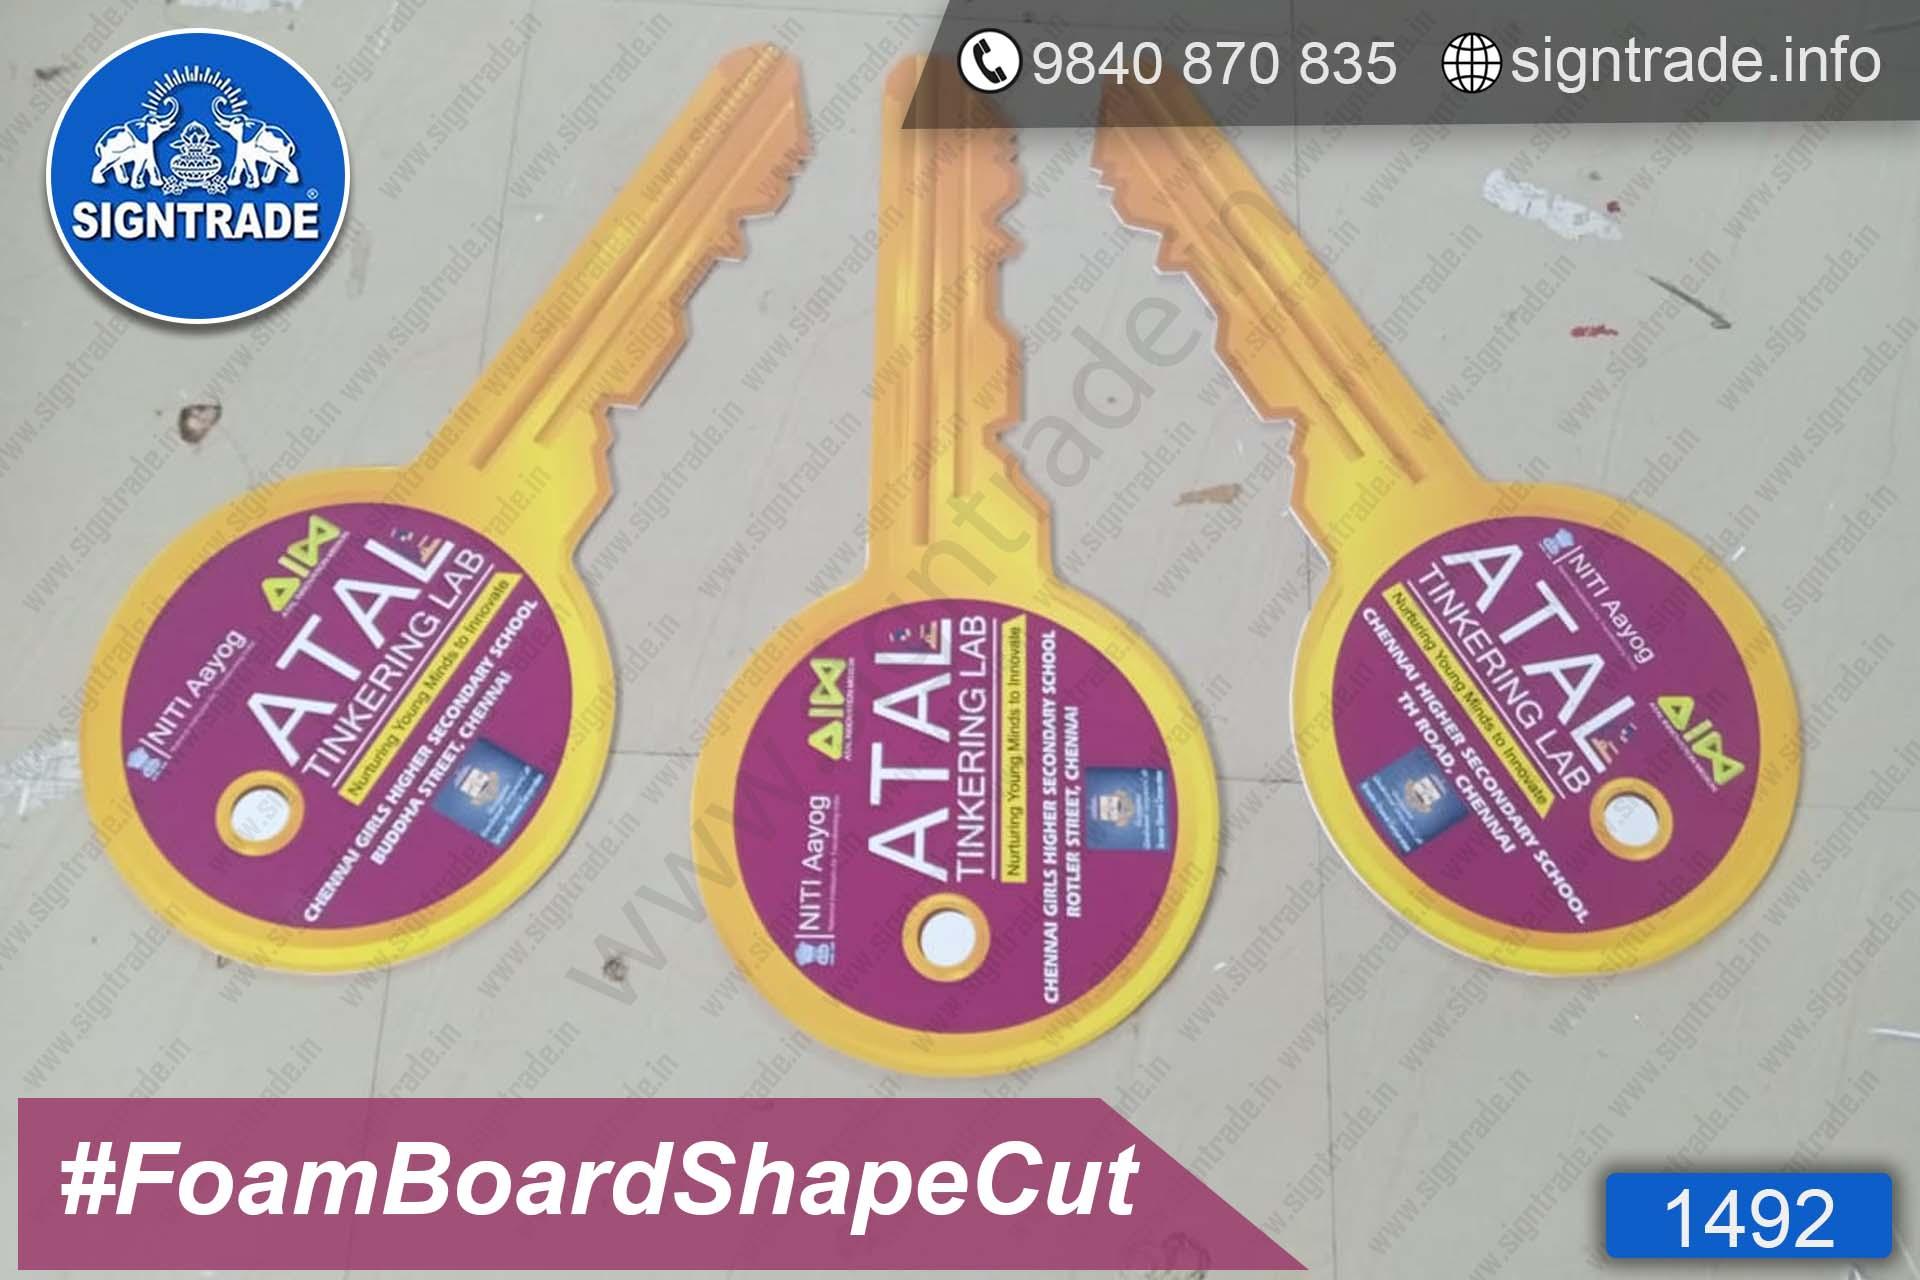 1492, Atal Tinkering Lab - Chennai - SIGNTRADE - Foam Board Shape Cut, Foam Board Promotional Cutout Display Stand Manufacturers in Chennai